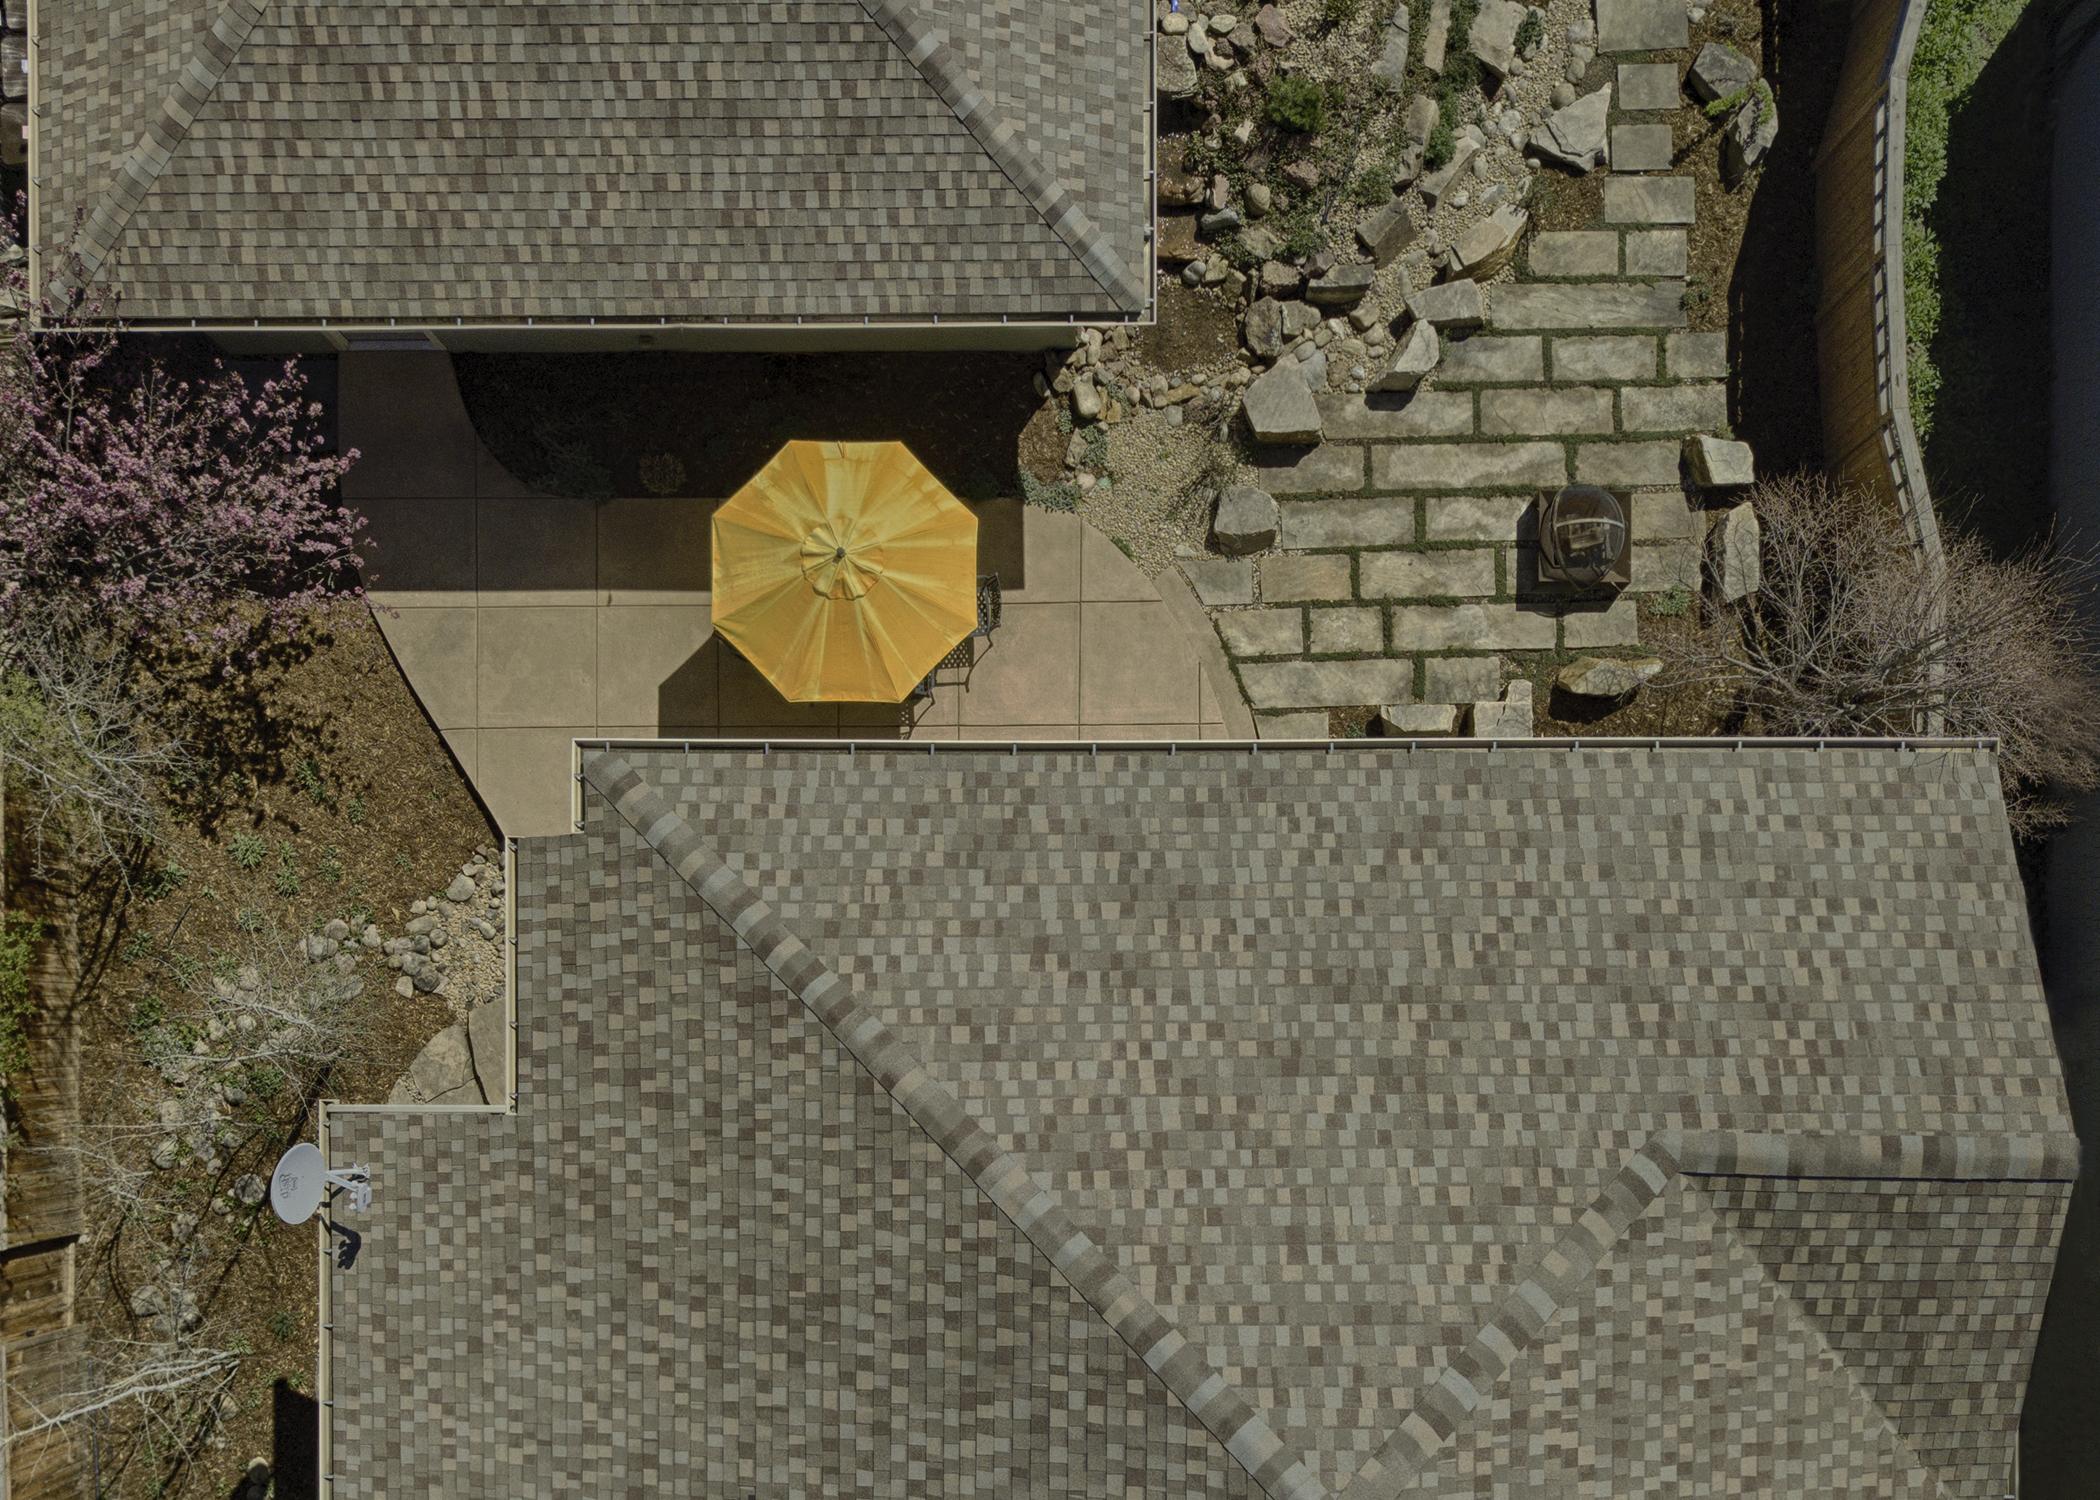 ©Robert D. Jones Photography Architecture Aerial Yellow Umbrella WP.jpg